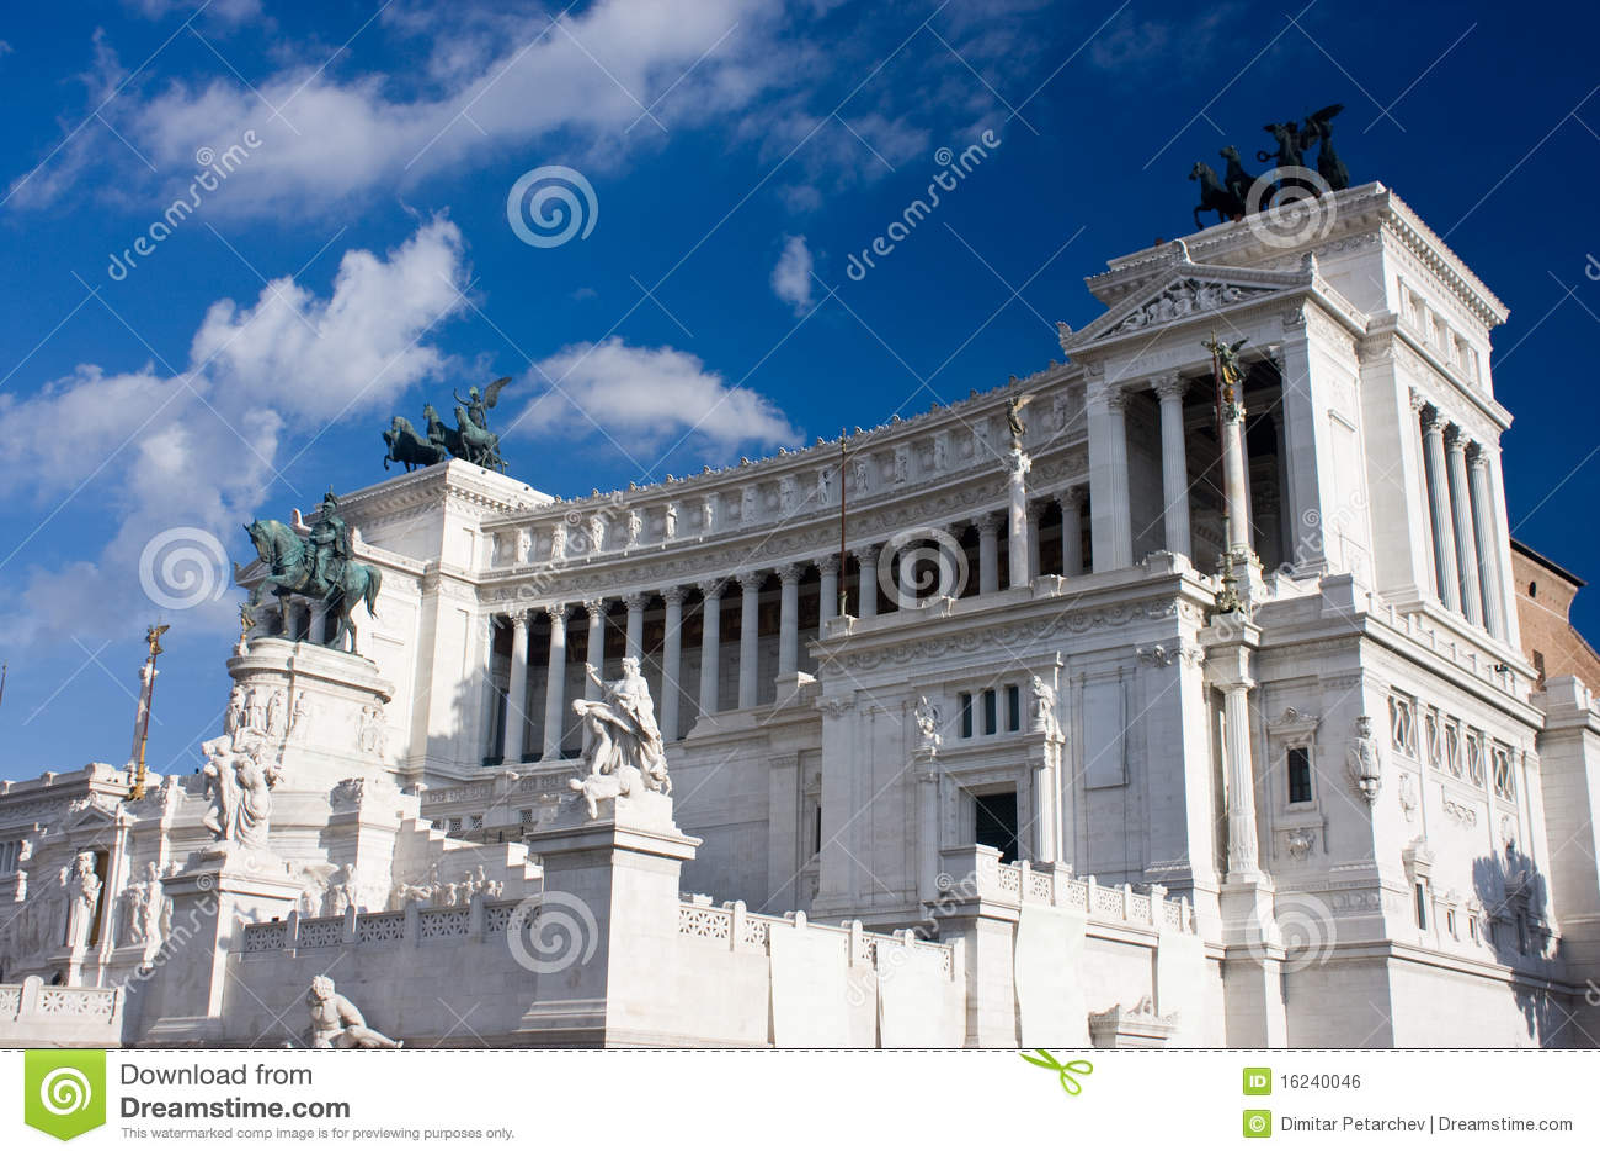 Parlament von rom lizenzfreies stockbild bild 16240046 for Roma parlamento